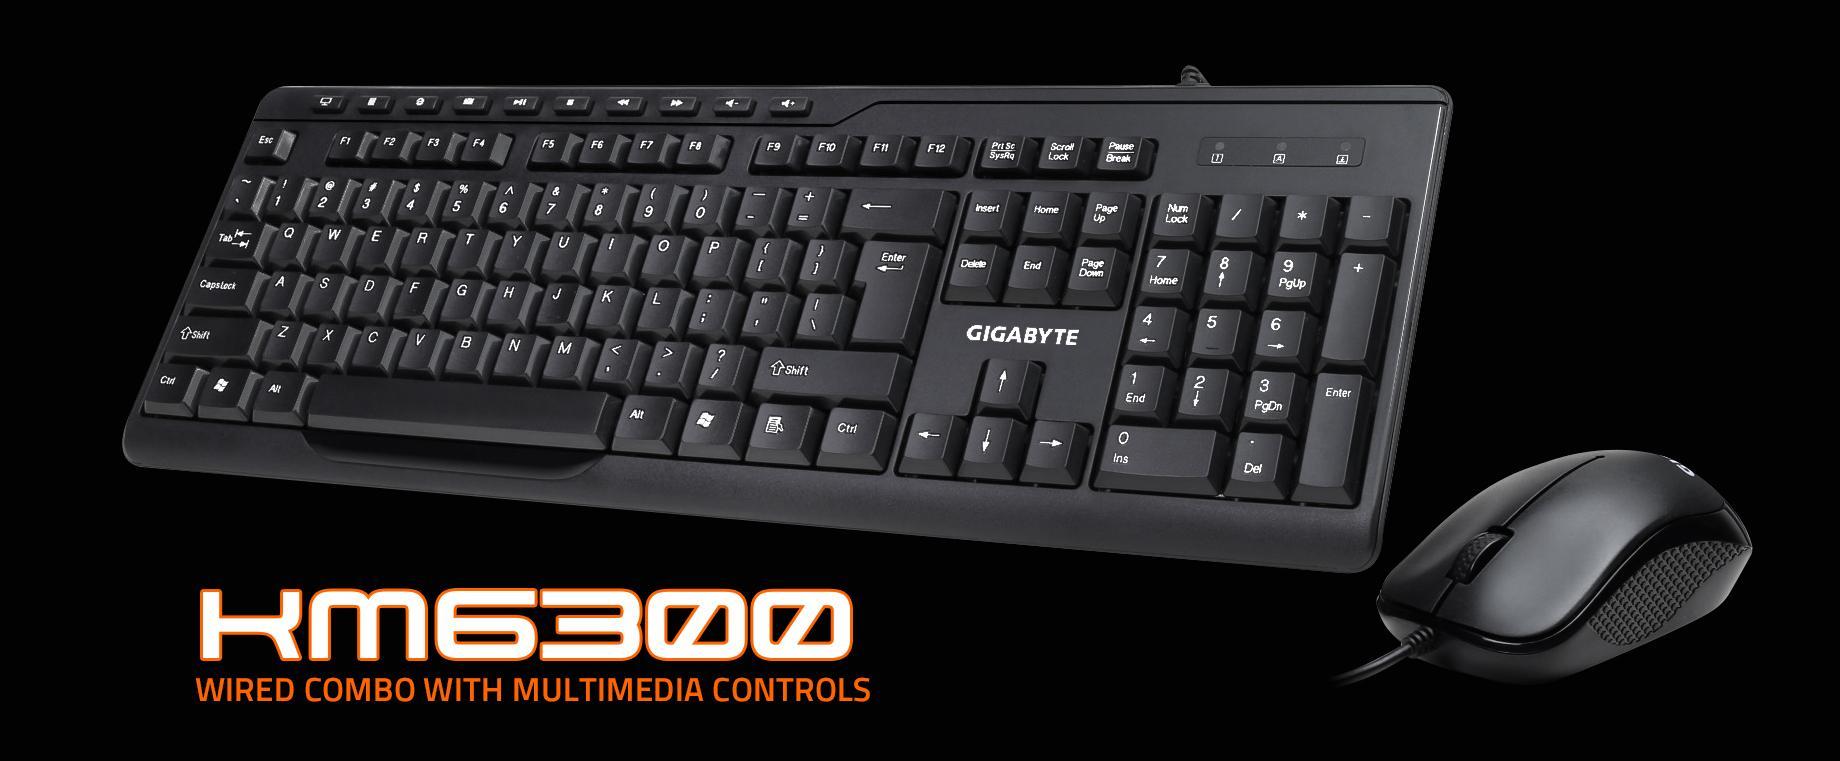 GIGABYTE KM6300 Keyboard